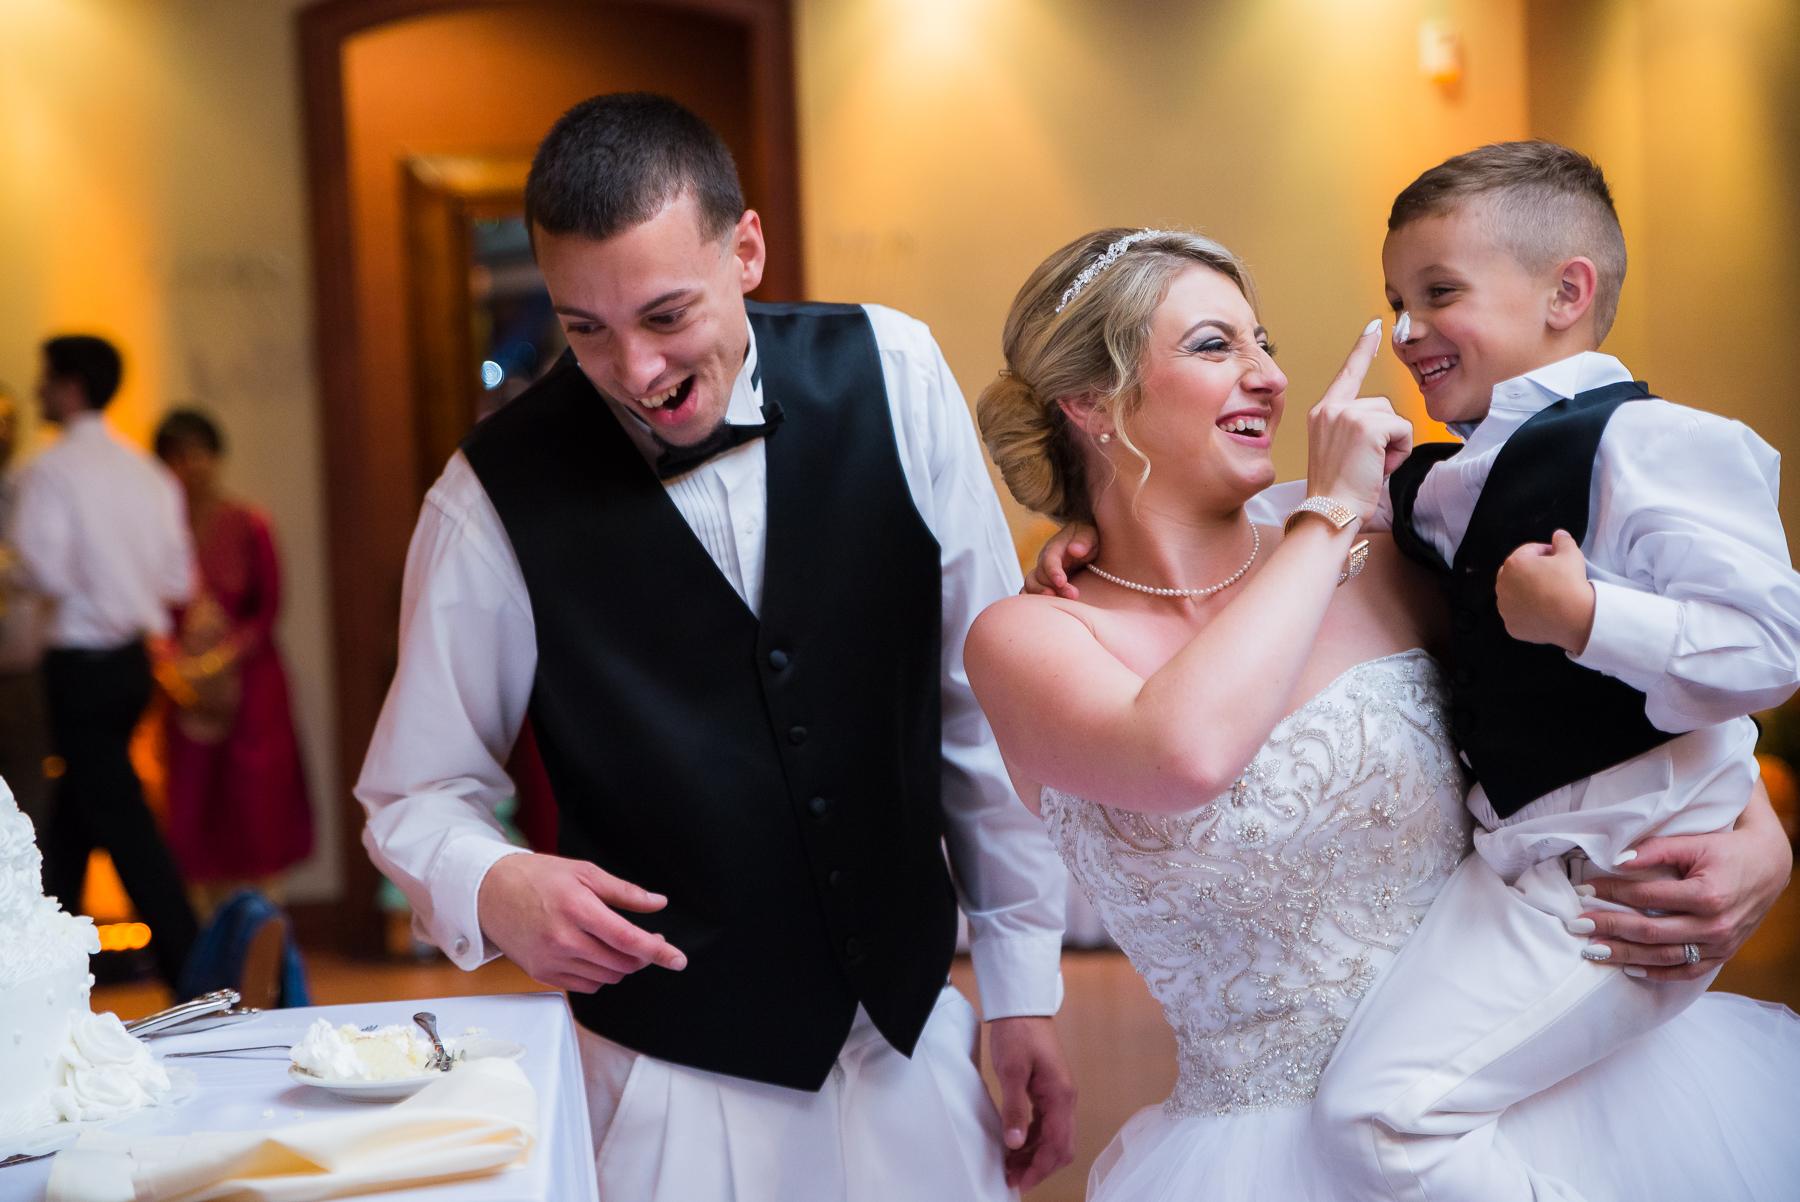 Kim-Ray-Wedding-Garcia-Photography-9147.jpg